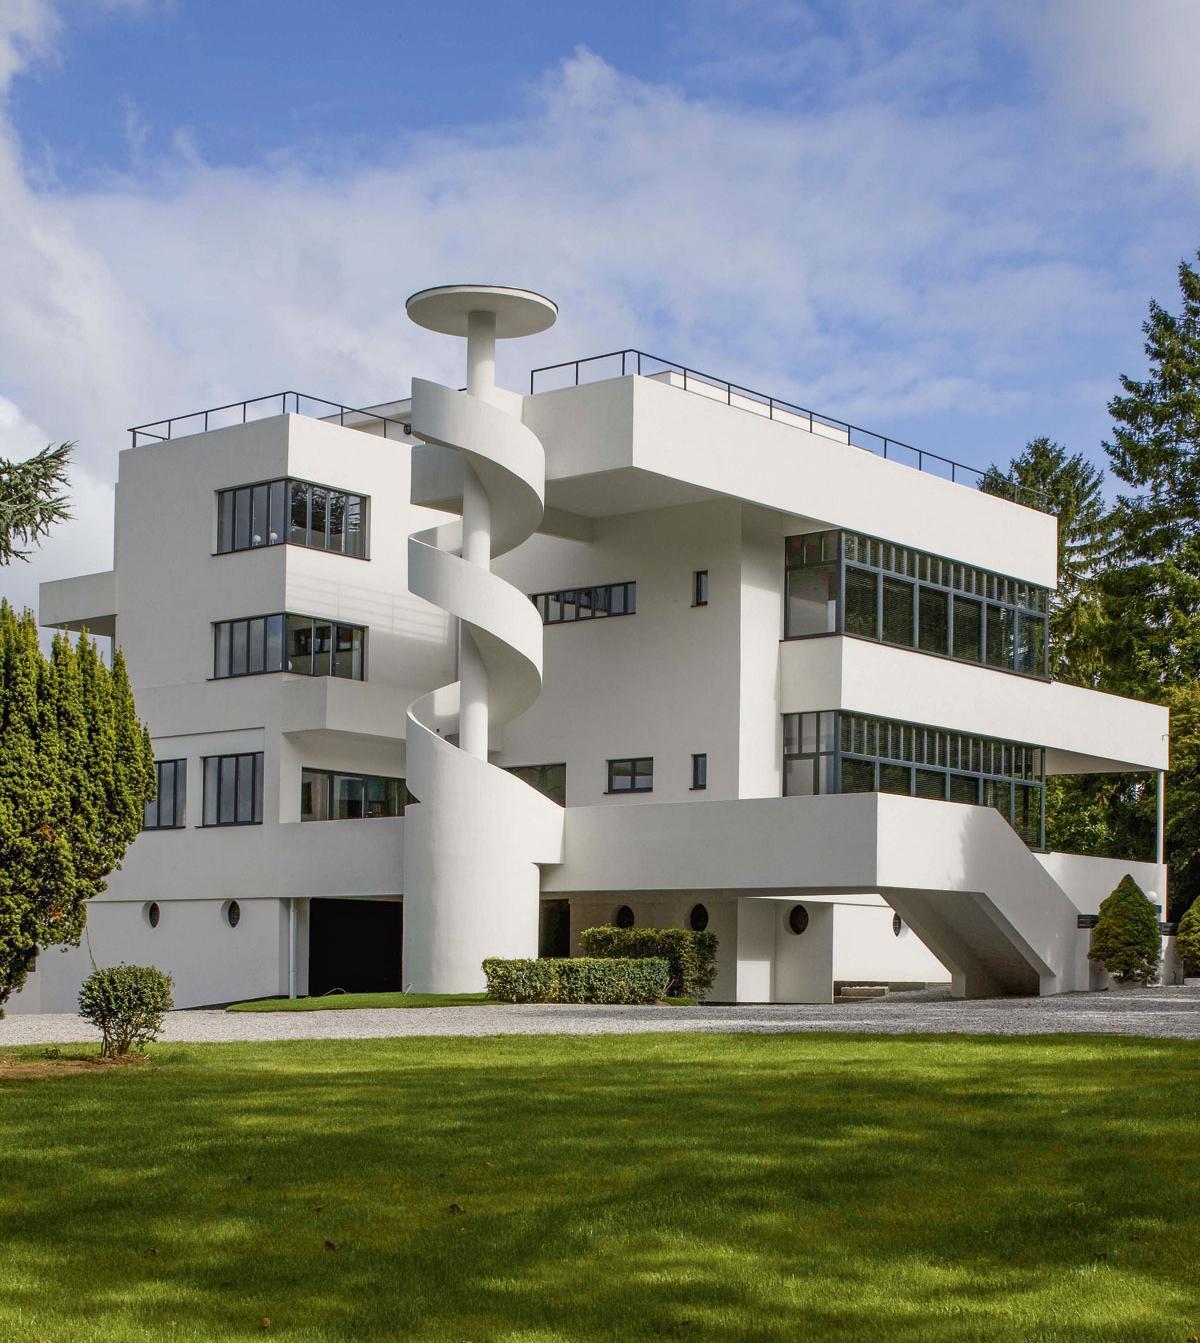 Villa Dirickx